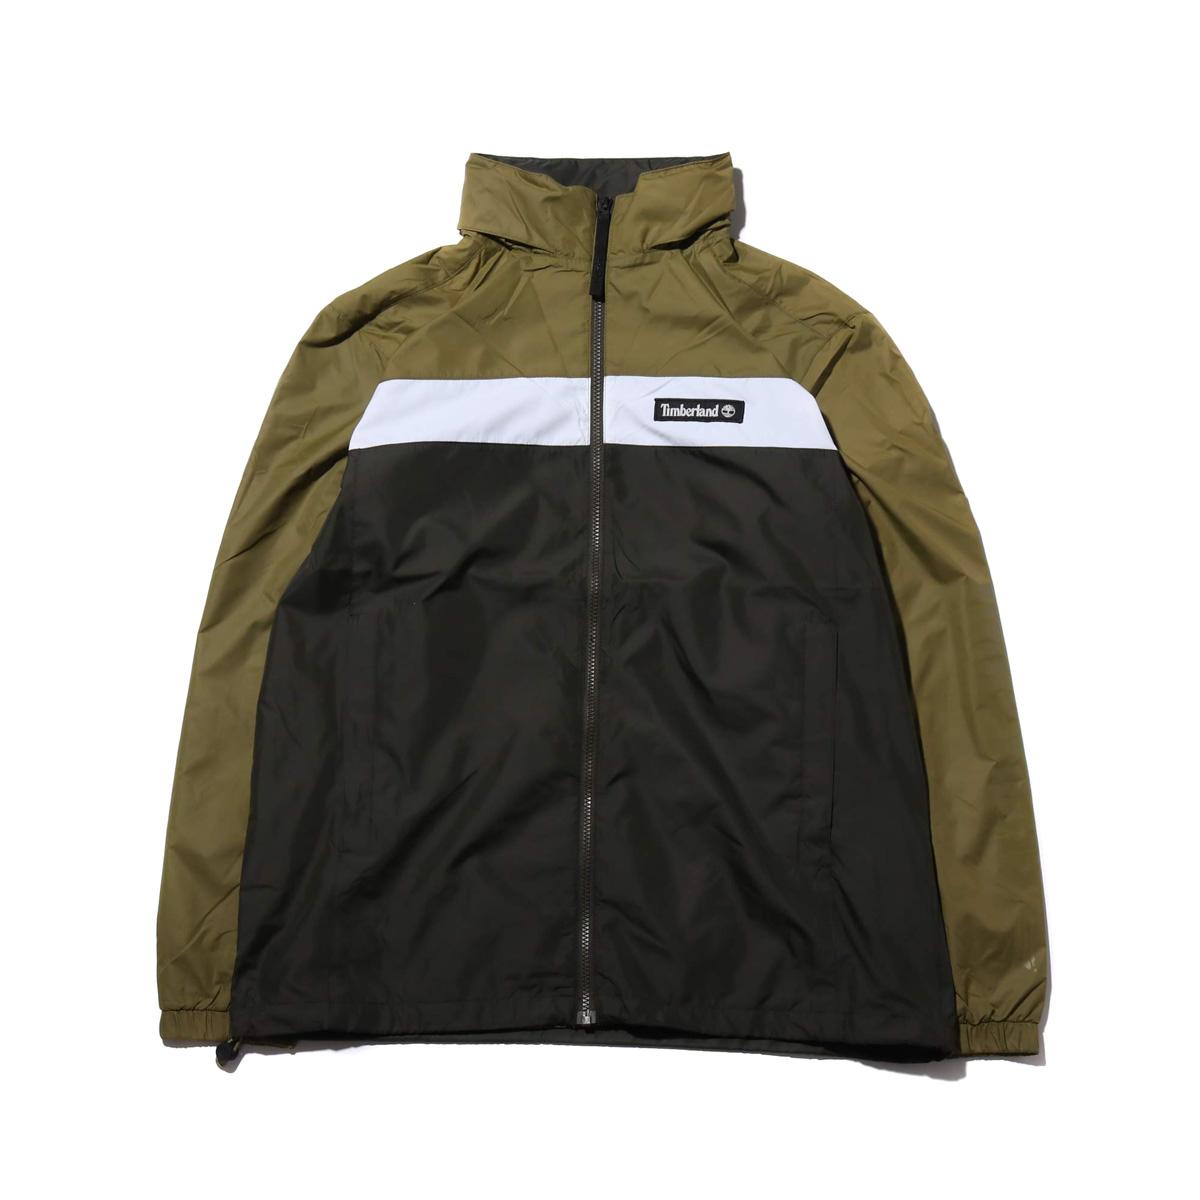 Timberland YCC Hooded full zip jacket(MARTINI OLIVE/PEAT)(ティンバーランド YCC フーデッド フルジップ ジャケット)【メンズ】【ジャケット】【19SS-I】